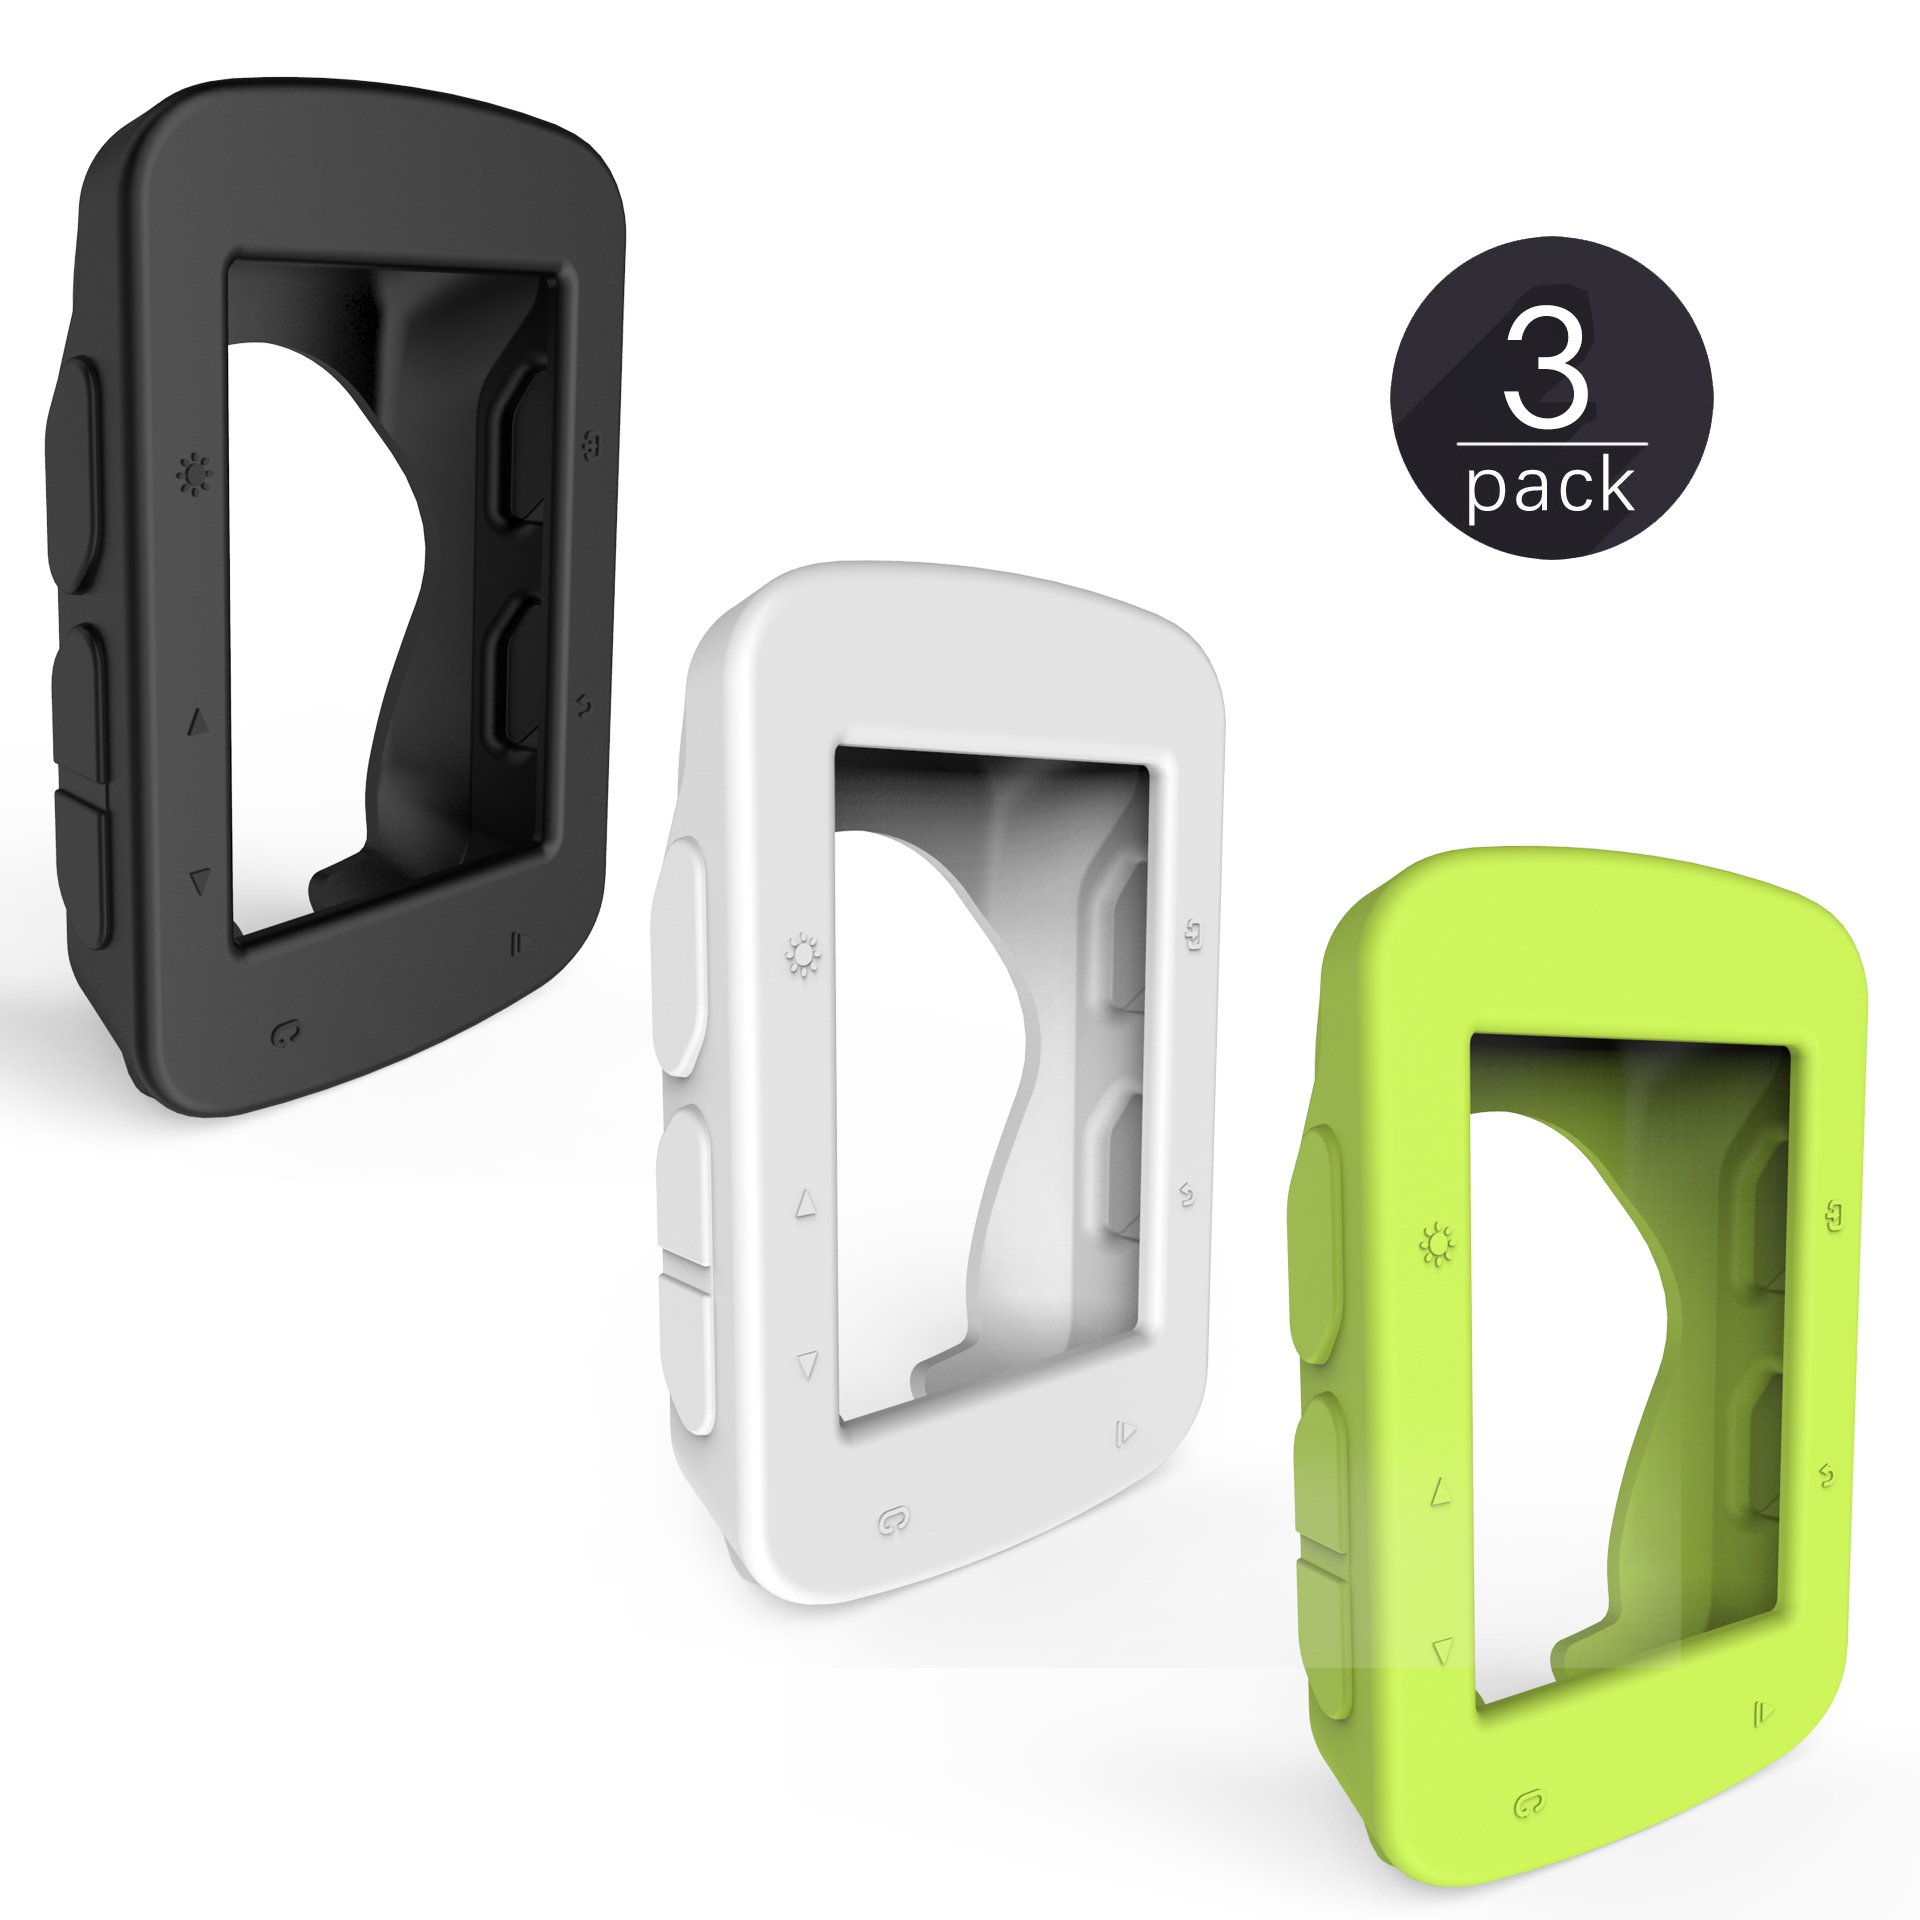 TUSITA [3-Pack] Silicone Case + Screen Protector for GarminEdge520/ Edge 520 Plus/Edge 820 GPS Bike Computer